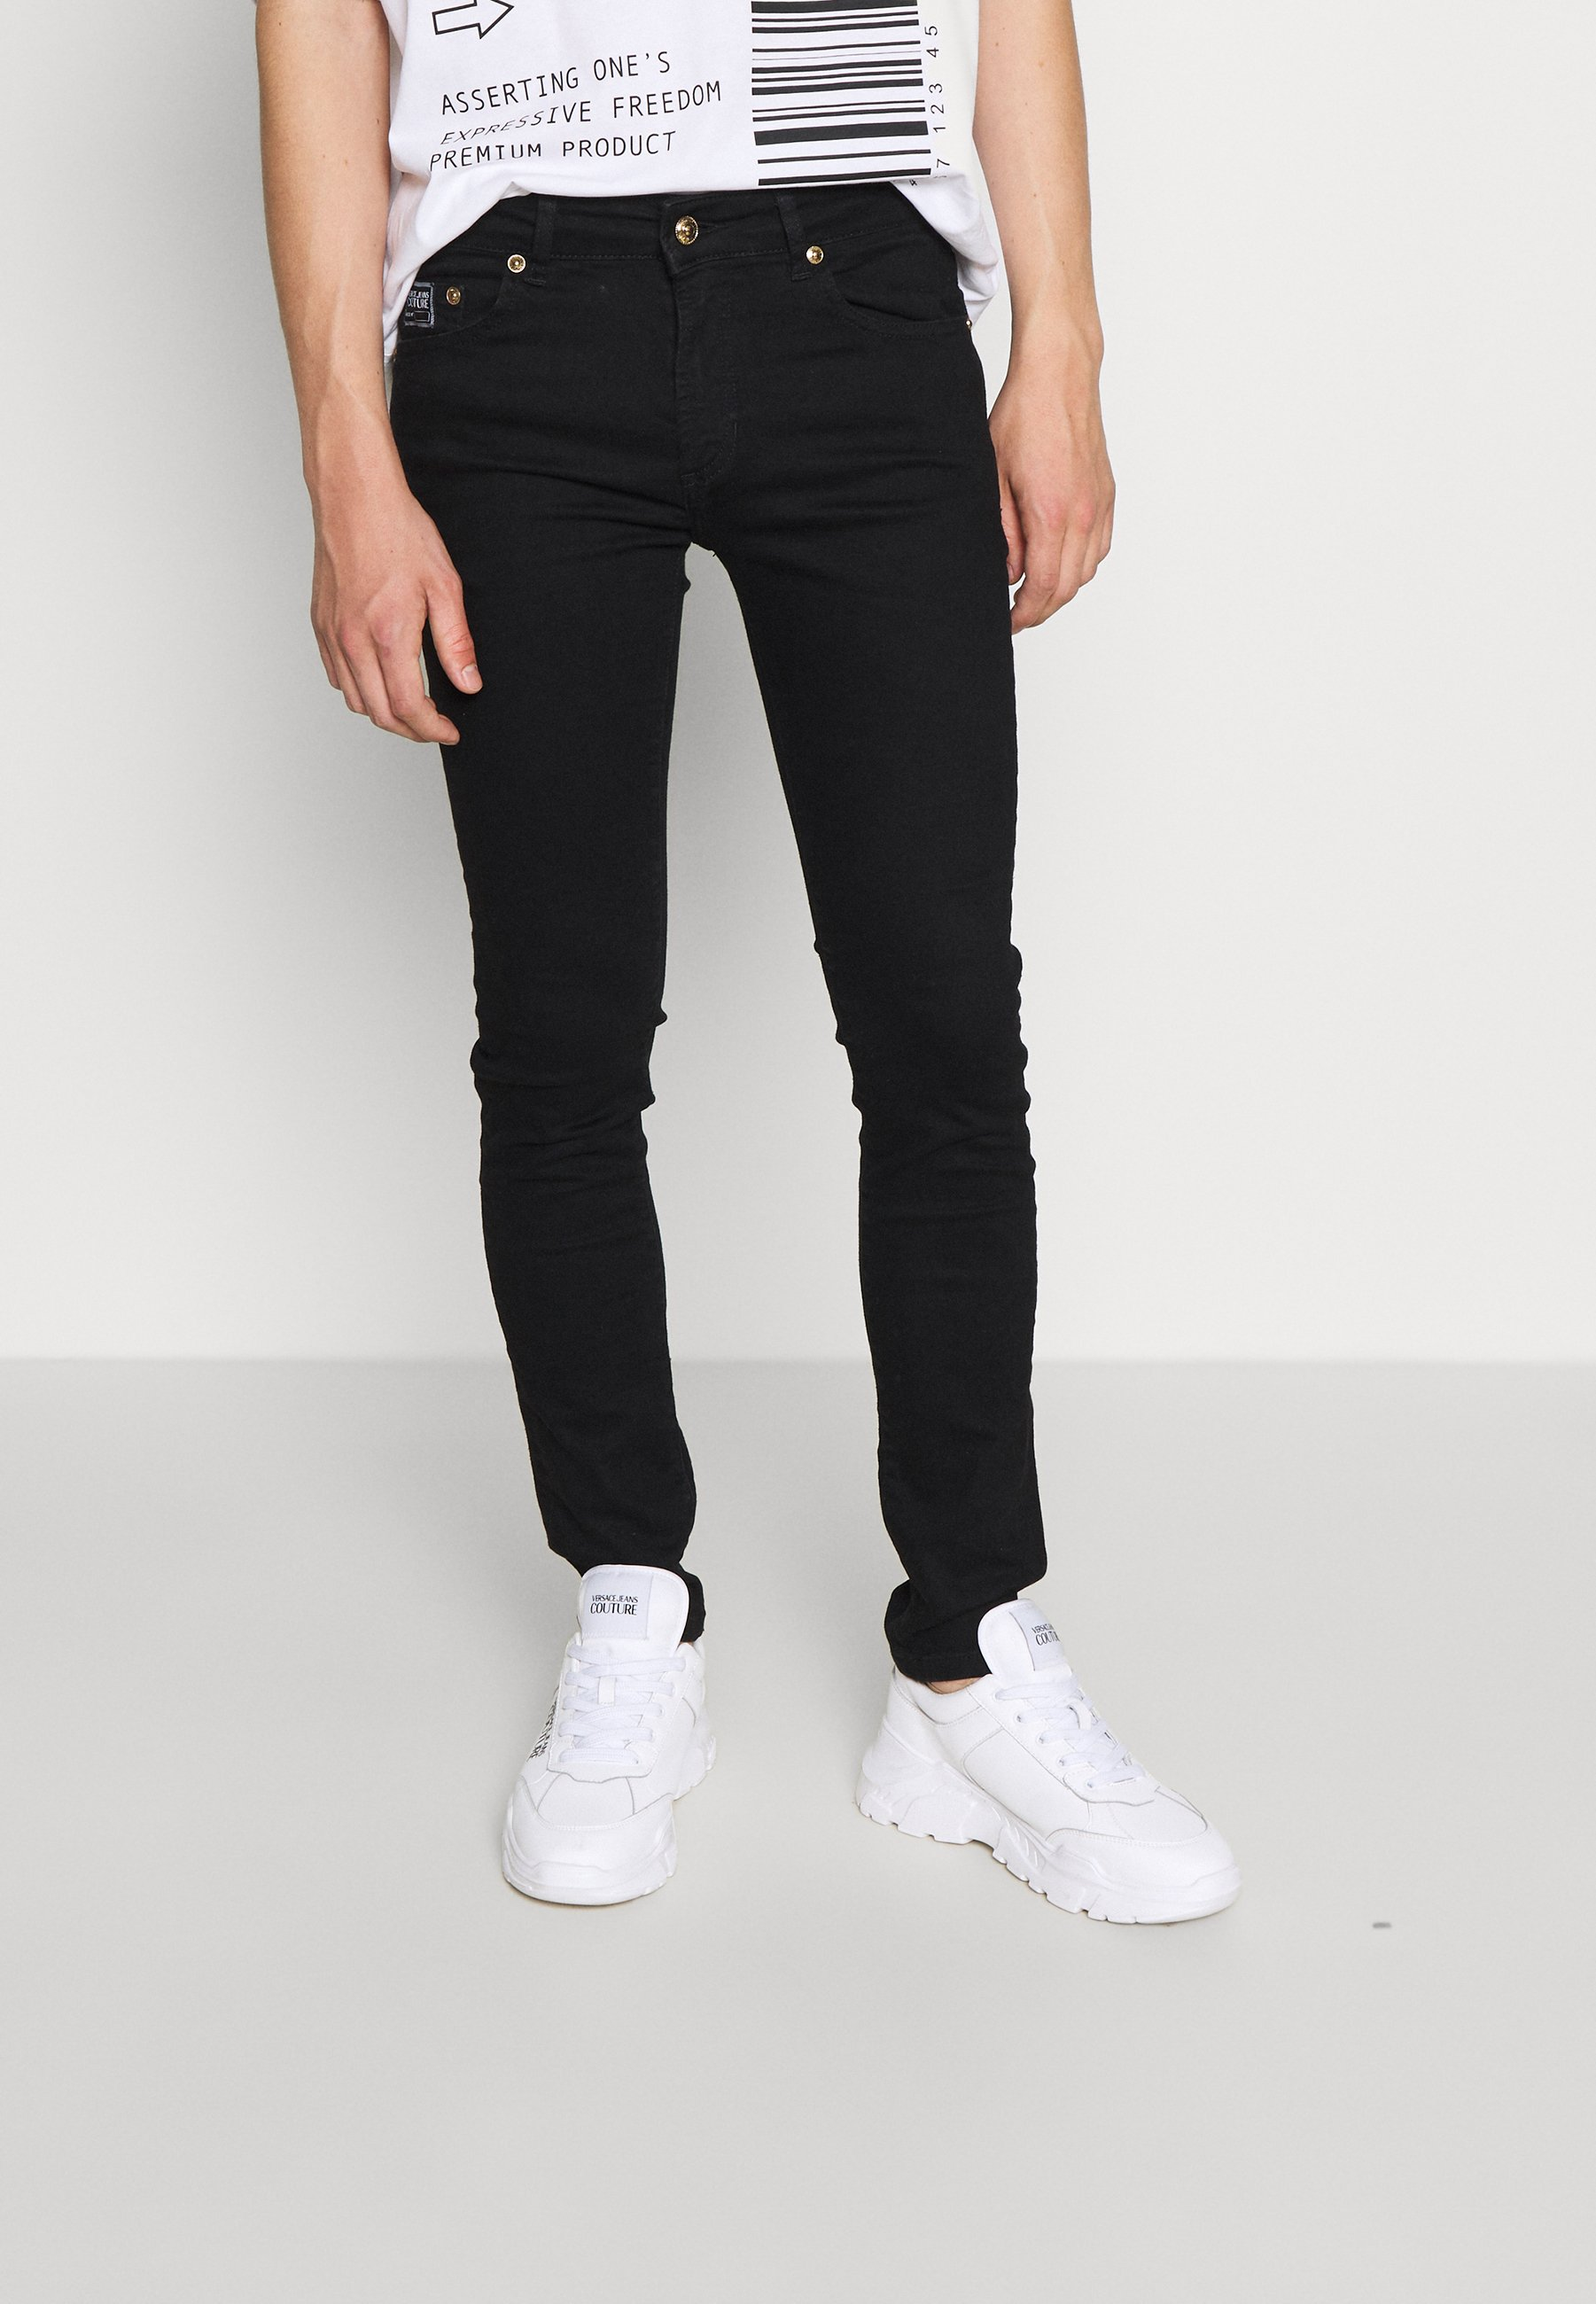 Uomo RINSE - Jeans slim fit - black